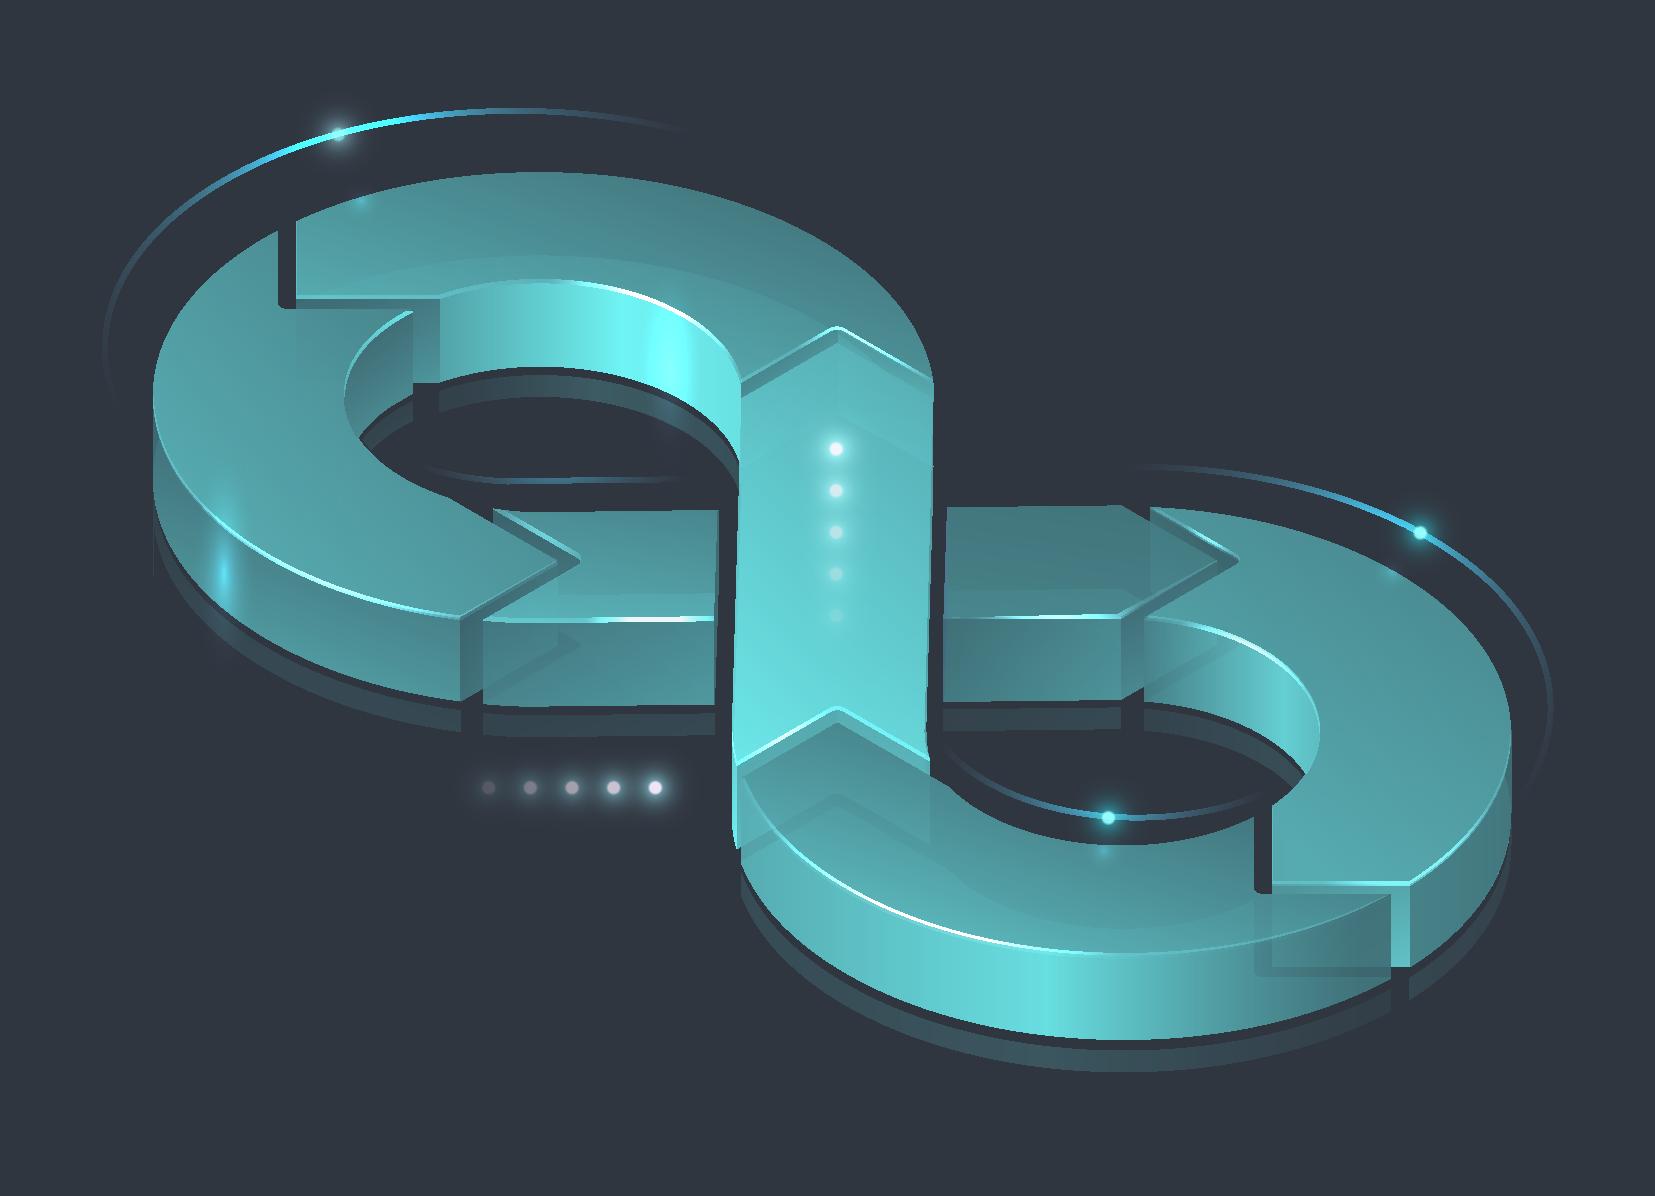 Data connection concept